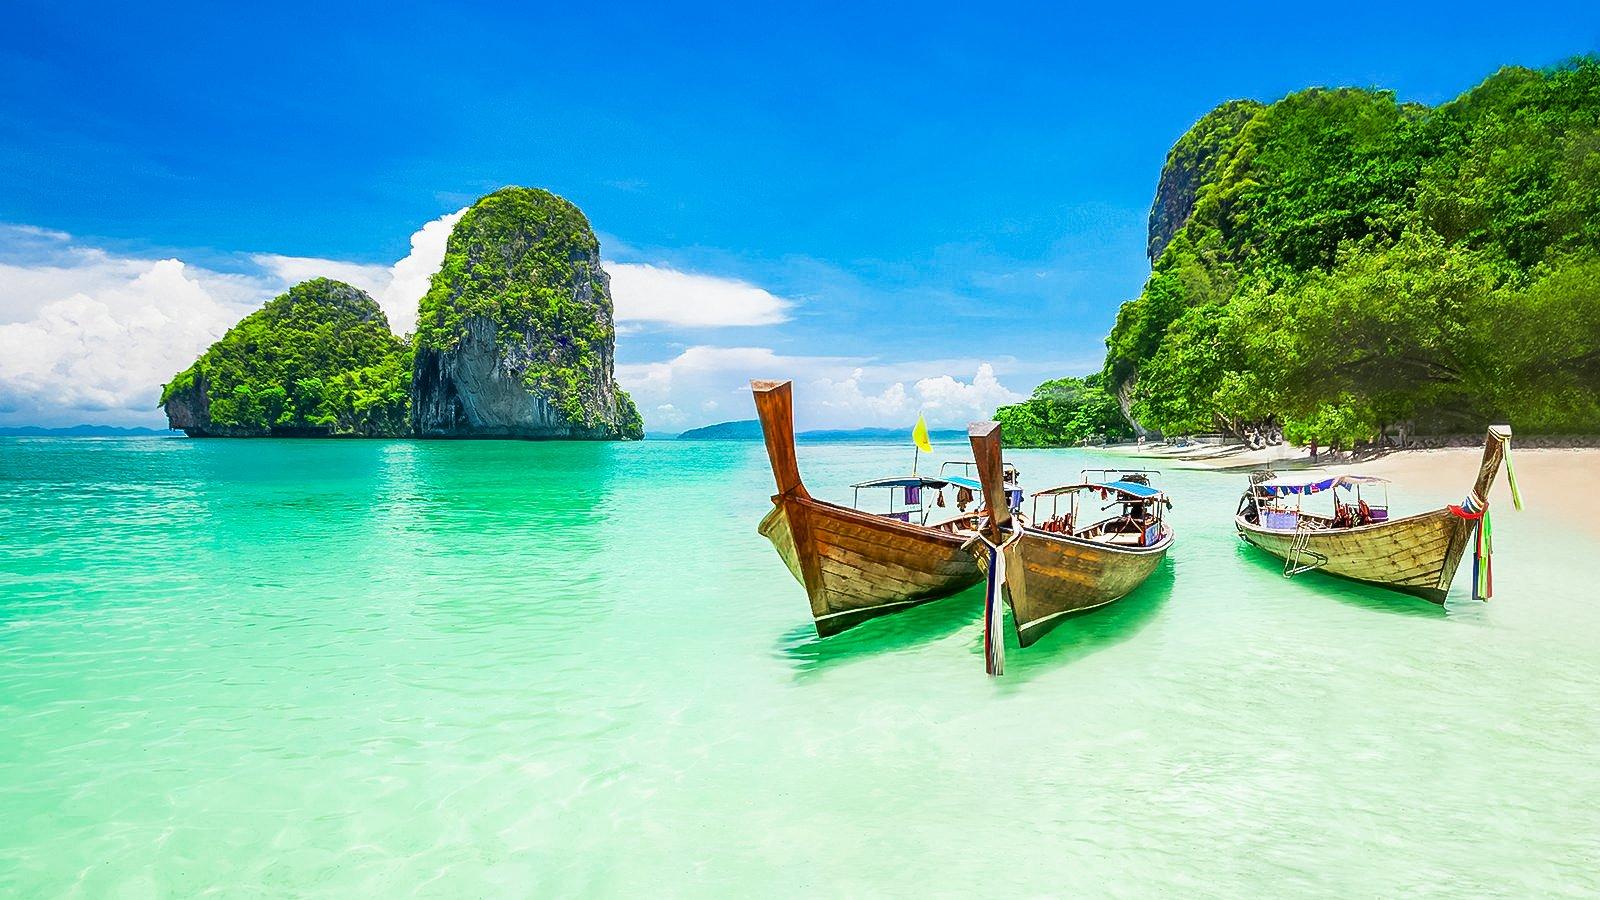 Krabi Beach in Thailand.